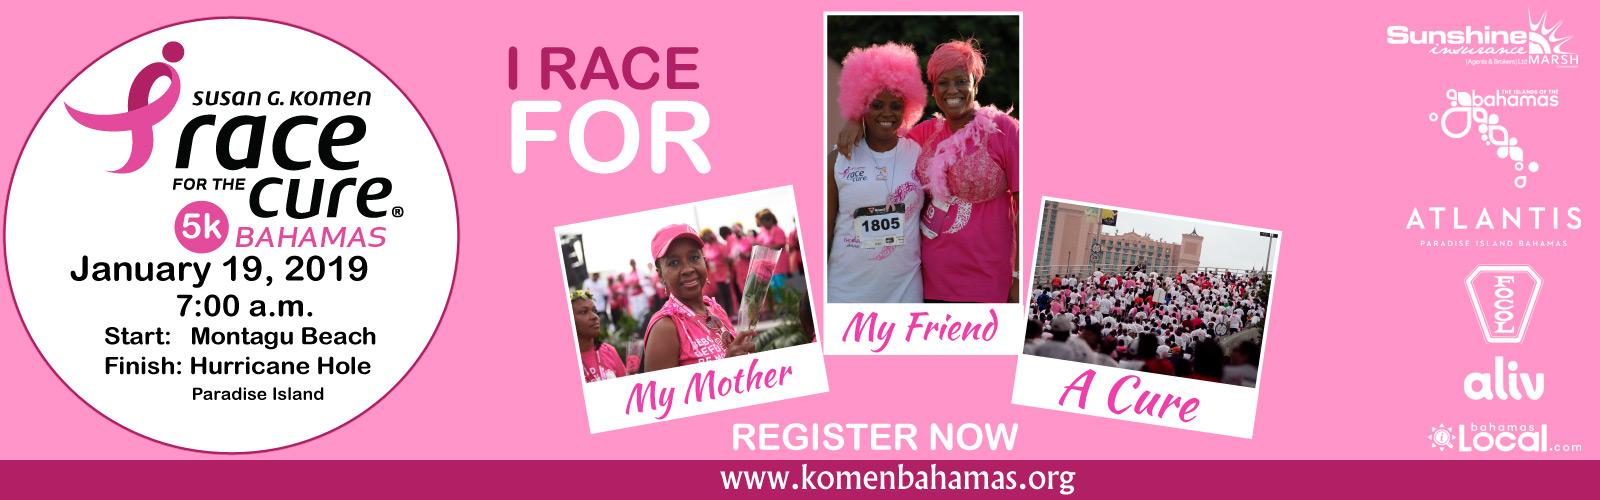 Susan G. Komen Bahamas Race for the Cure